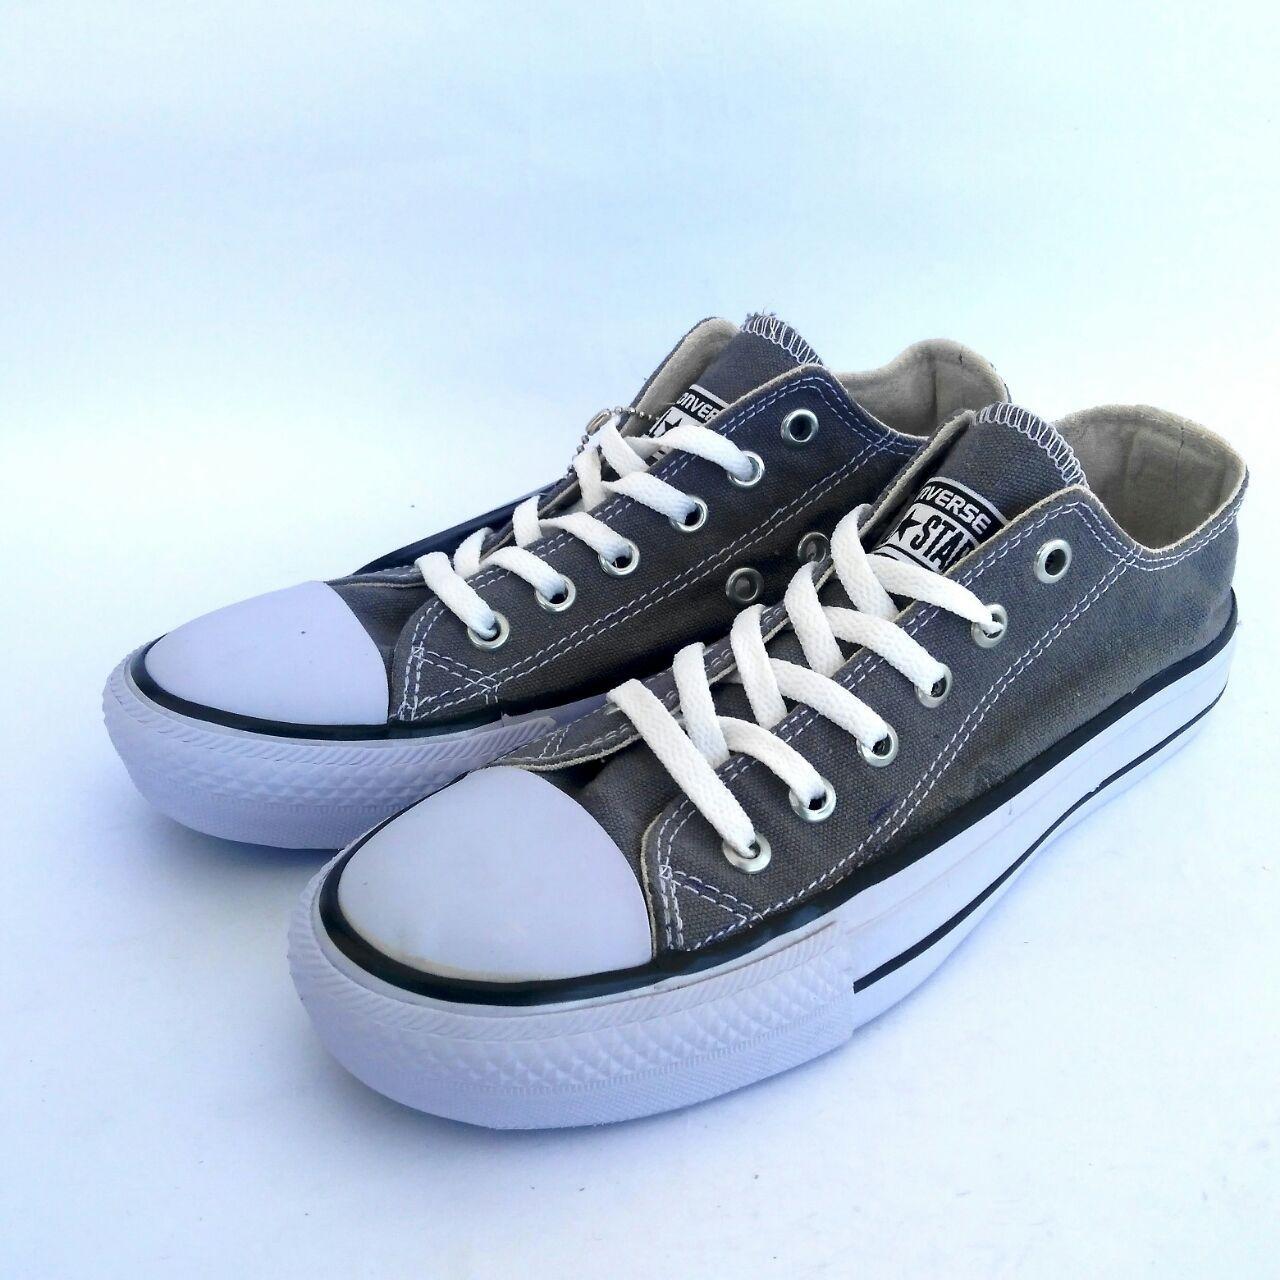 e141b0827daa68c5d7a0e520c0c18efe Review Daftar Harga Sepatu Converse Flexi Terlaris saat ini